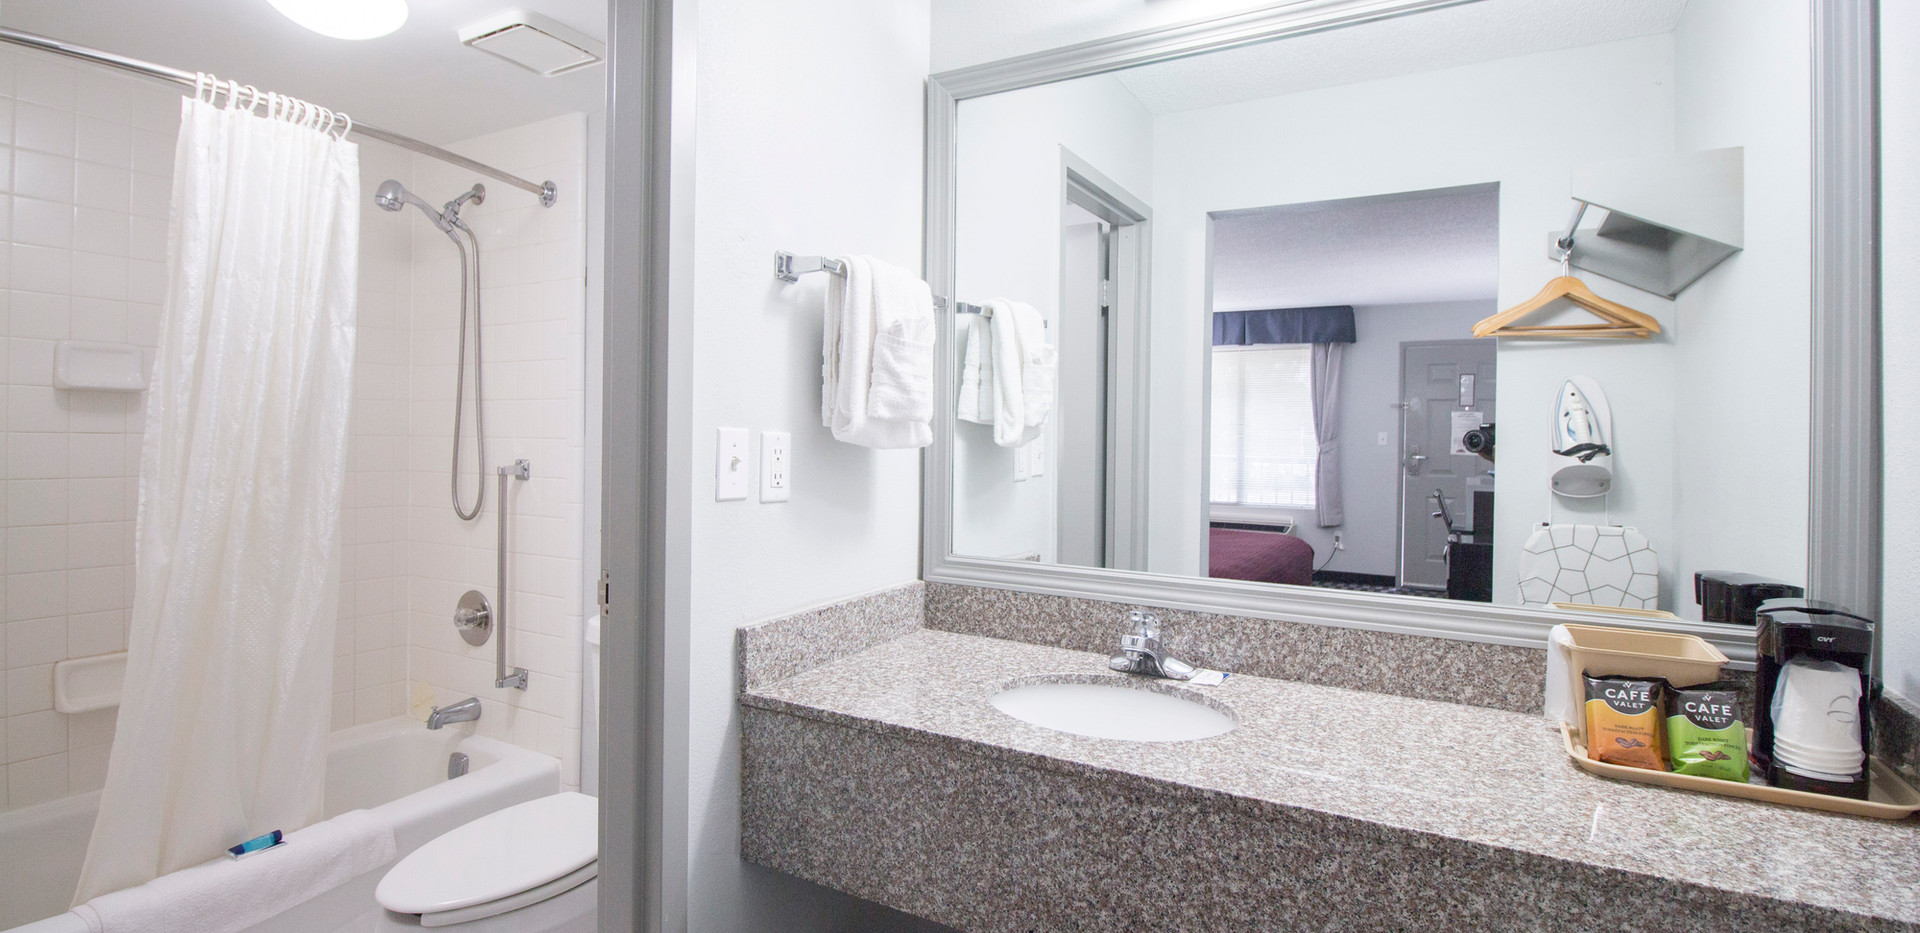 Standard Bathroom and Vanity Area